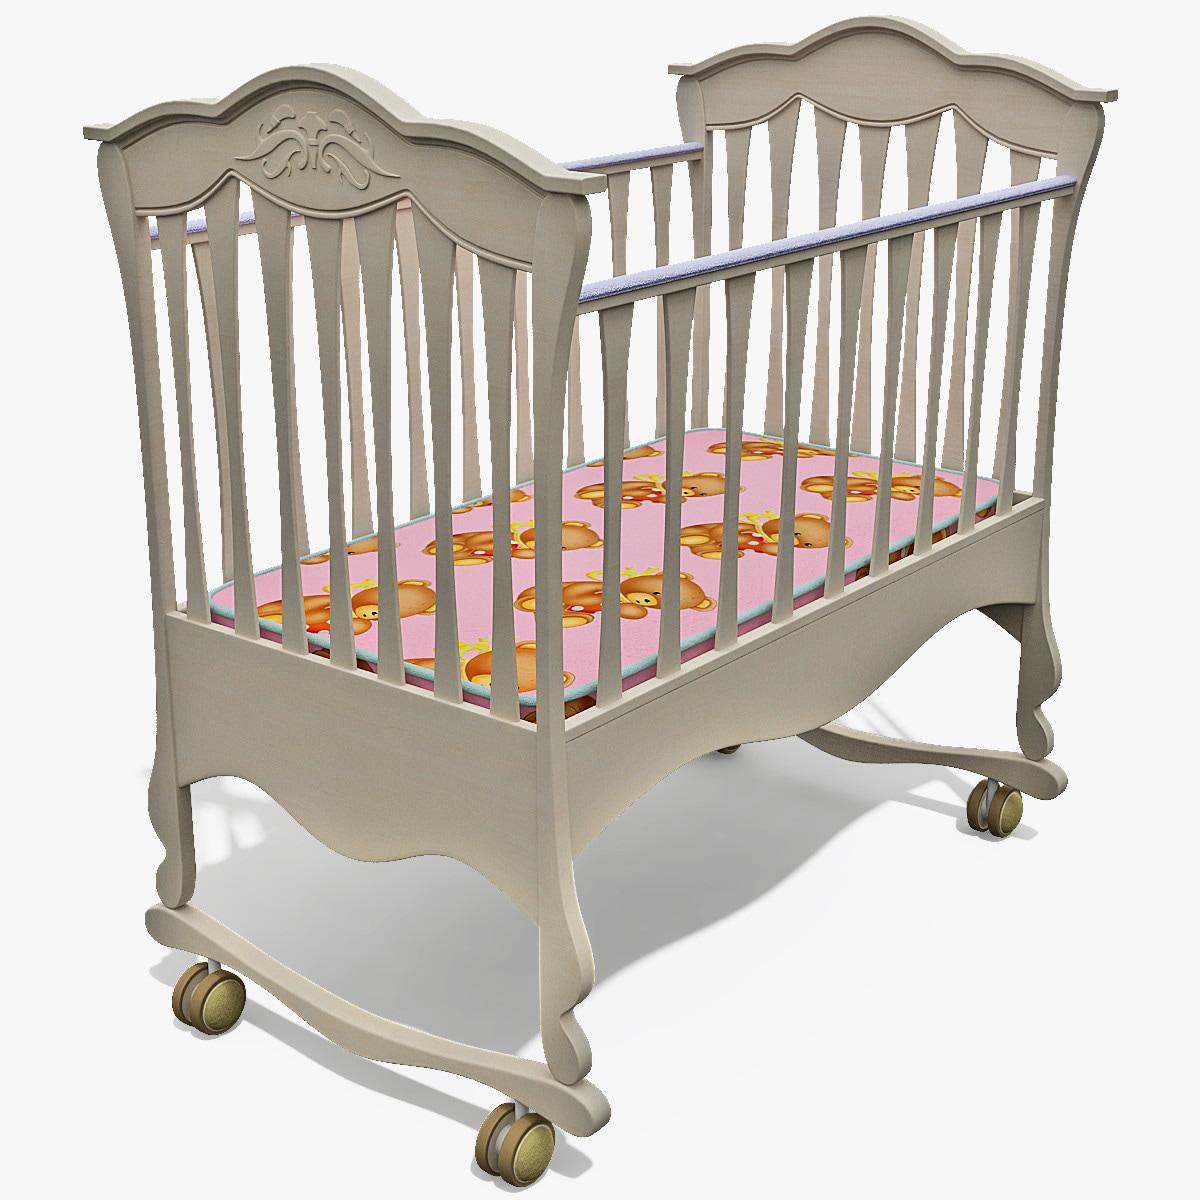 Baby_Bed_000.jpg6e898a48-0169-495a-8073-bd2d39f78edaOriginal.jpg